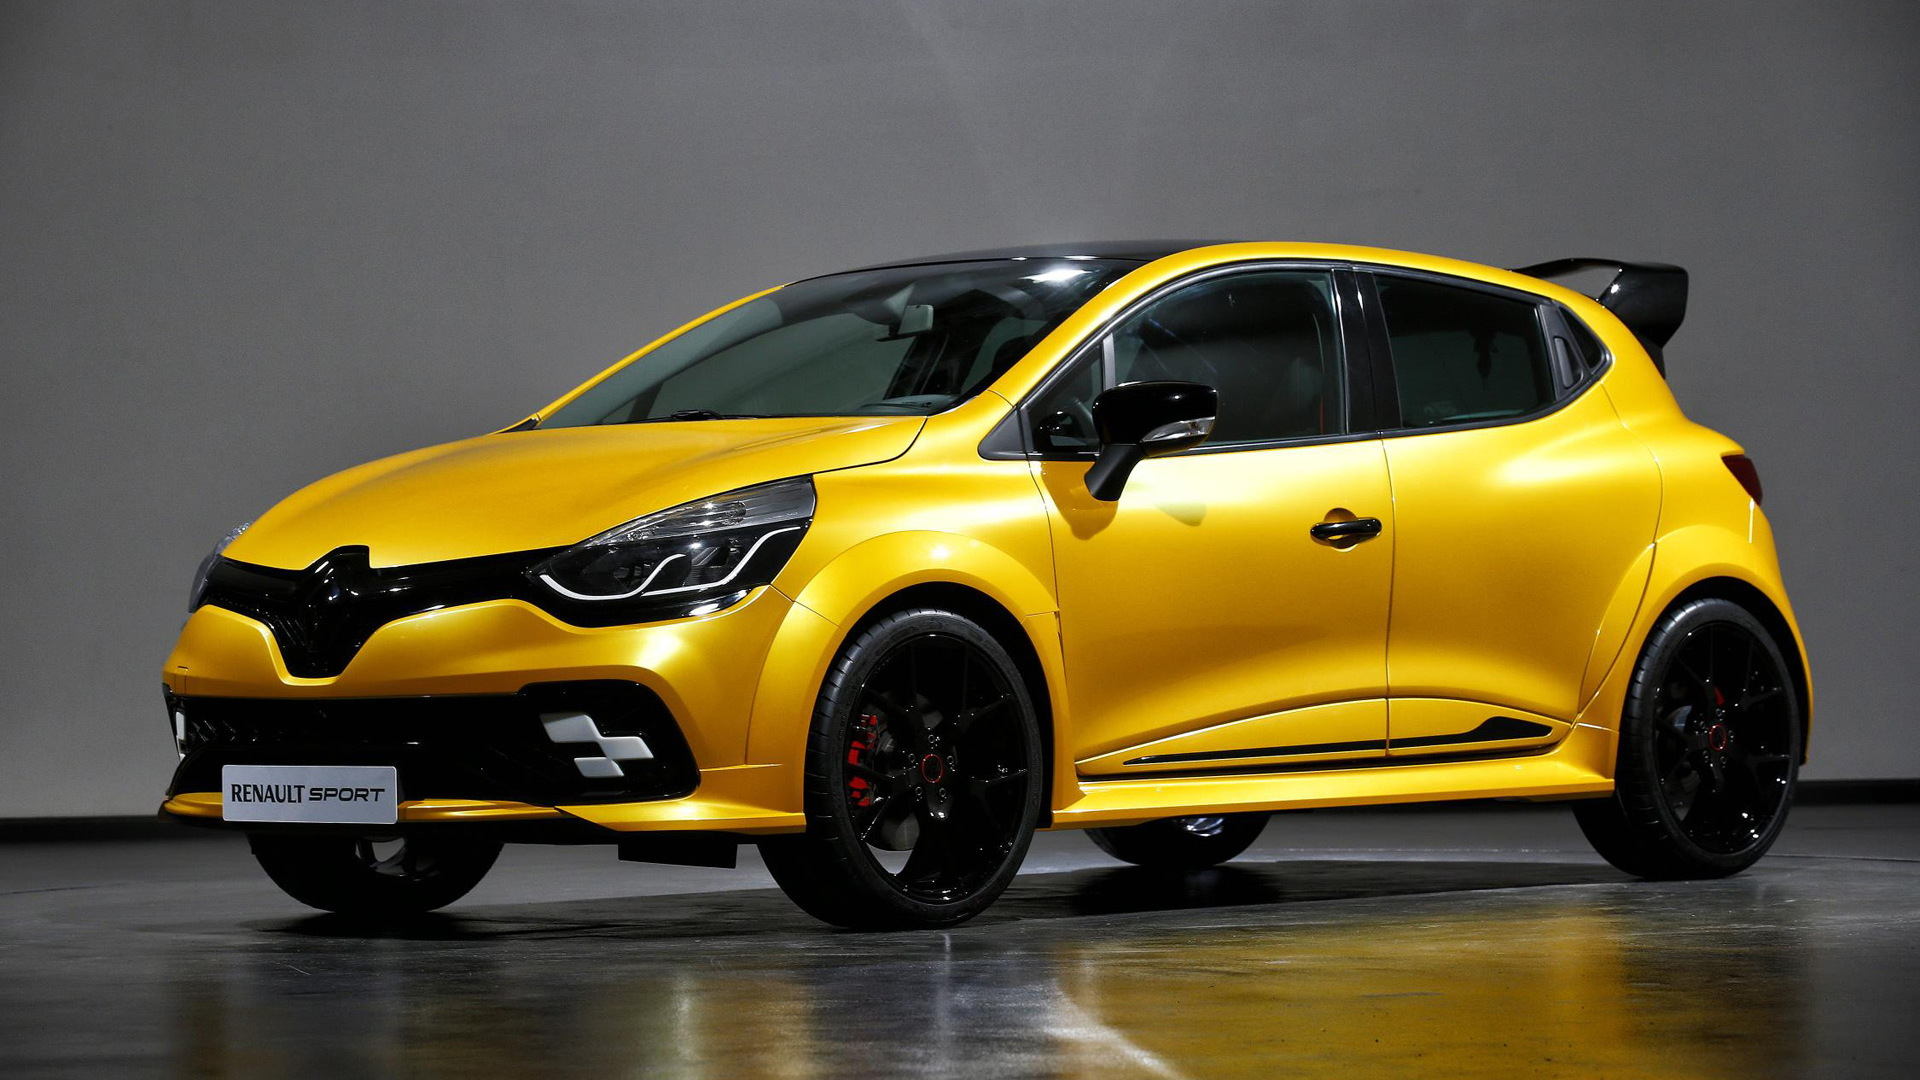 Renault Clio RS16 concept